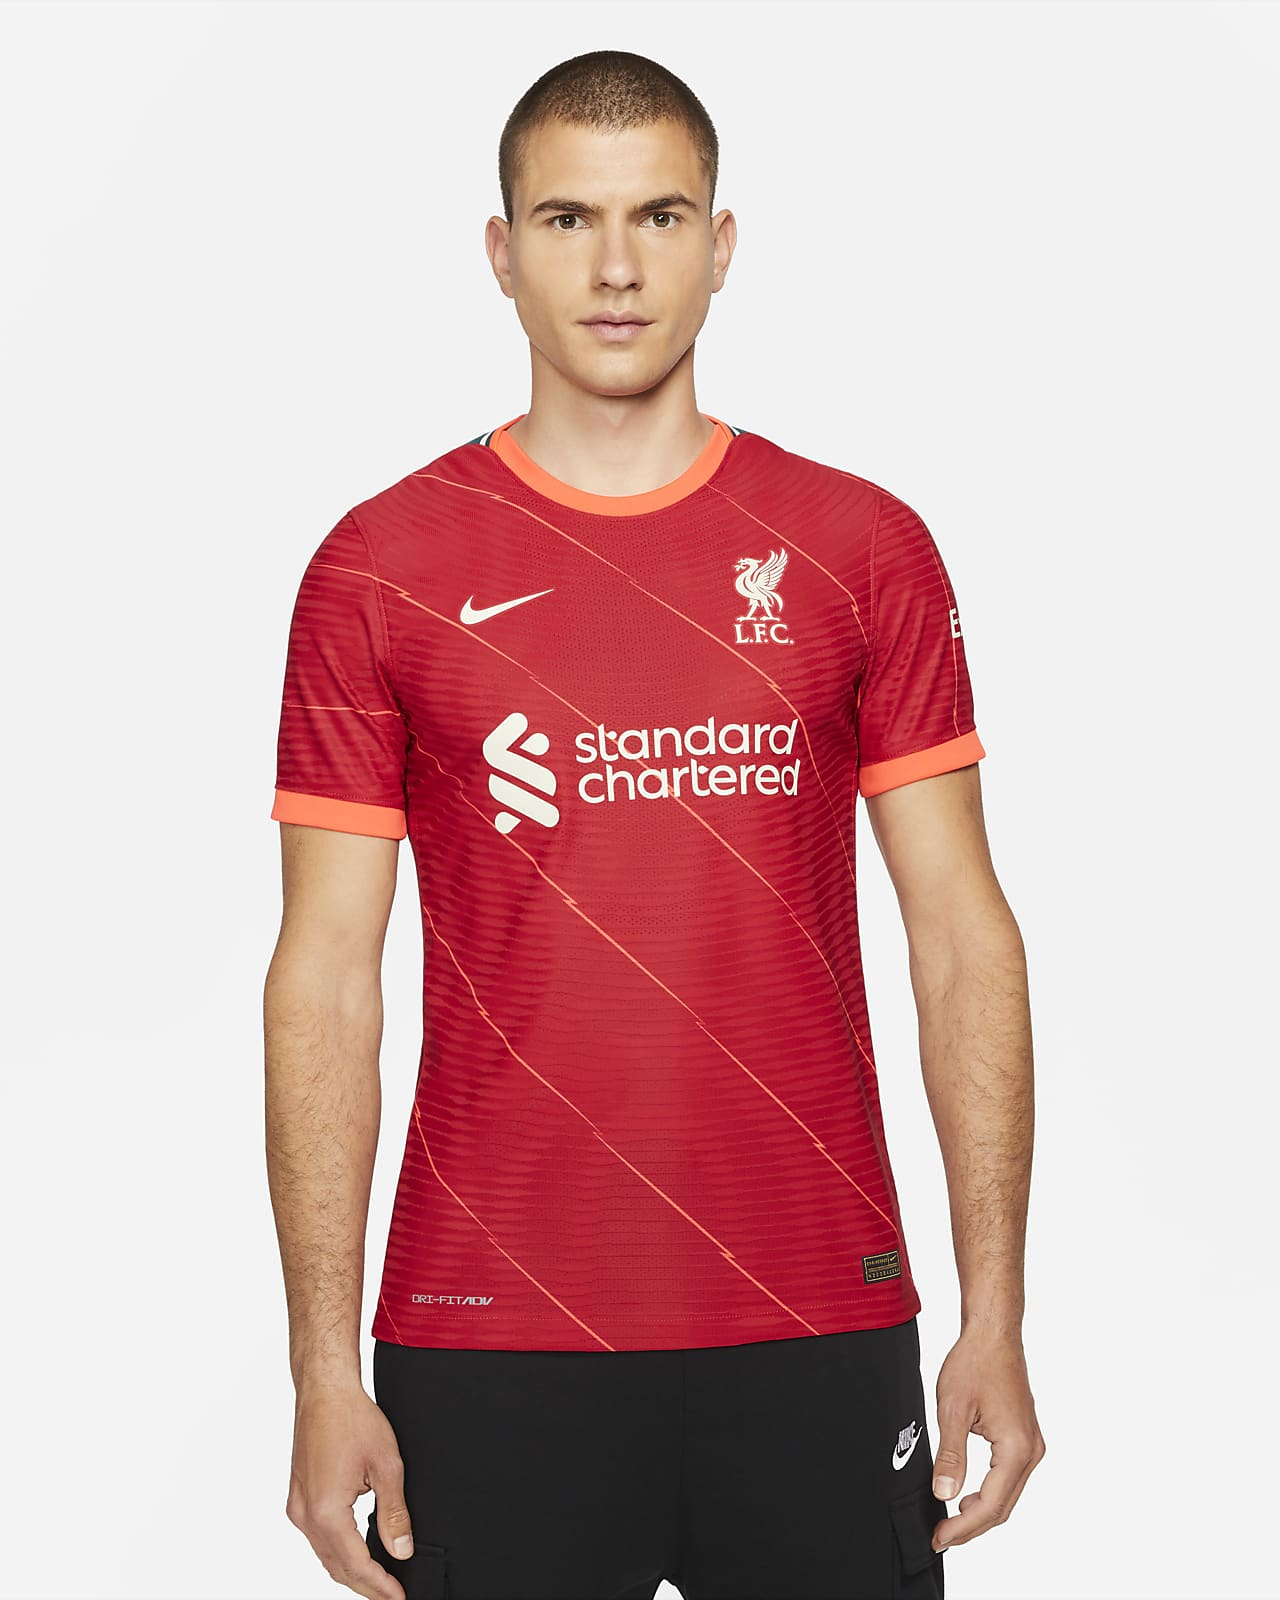 Jersey de fútbol Nike Dri-FIT ADV del Liverpool FC 2021/22 local Match para hombre